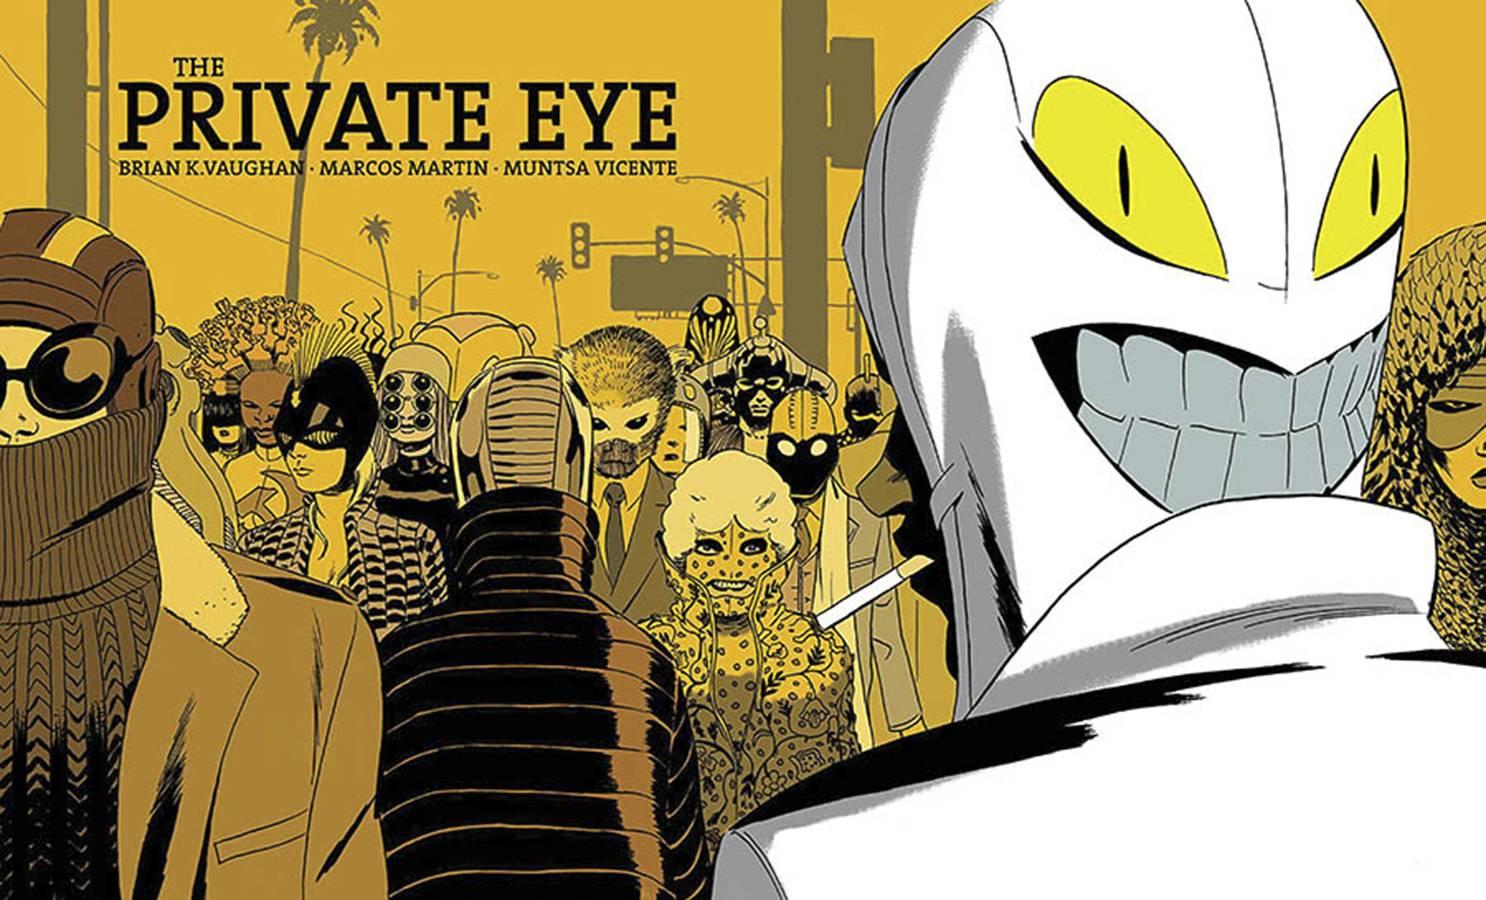 The Private Eye.jpg